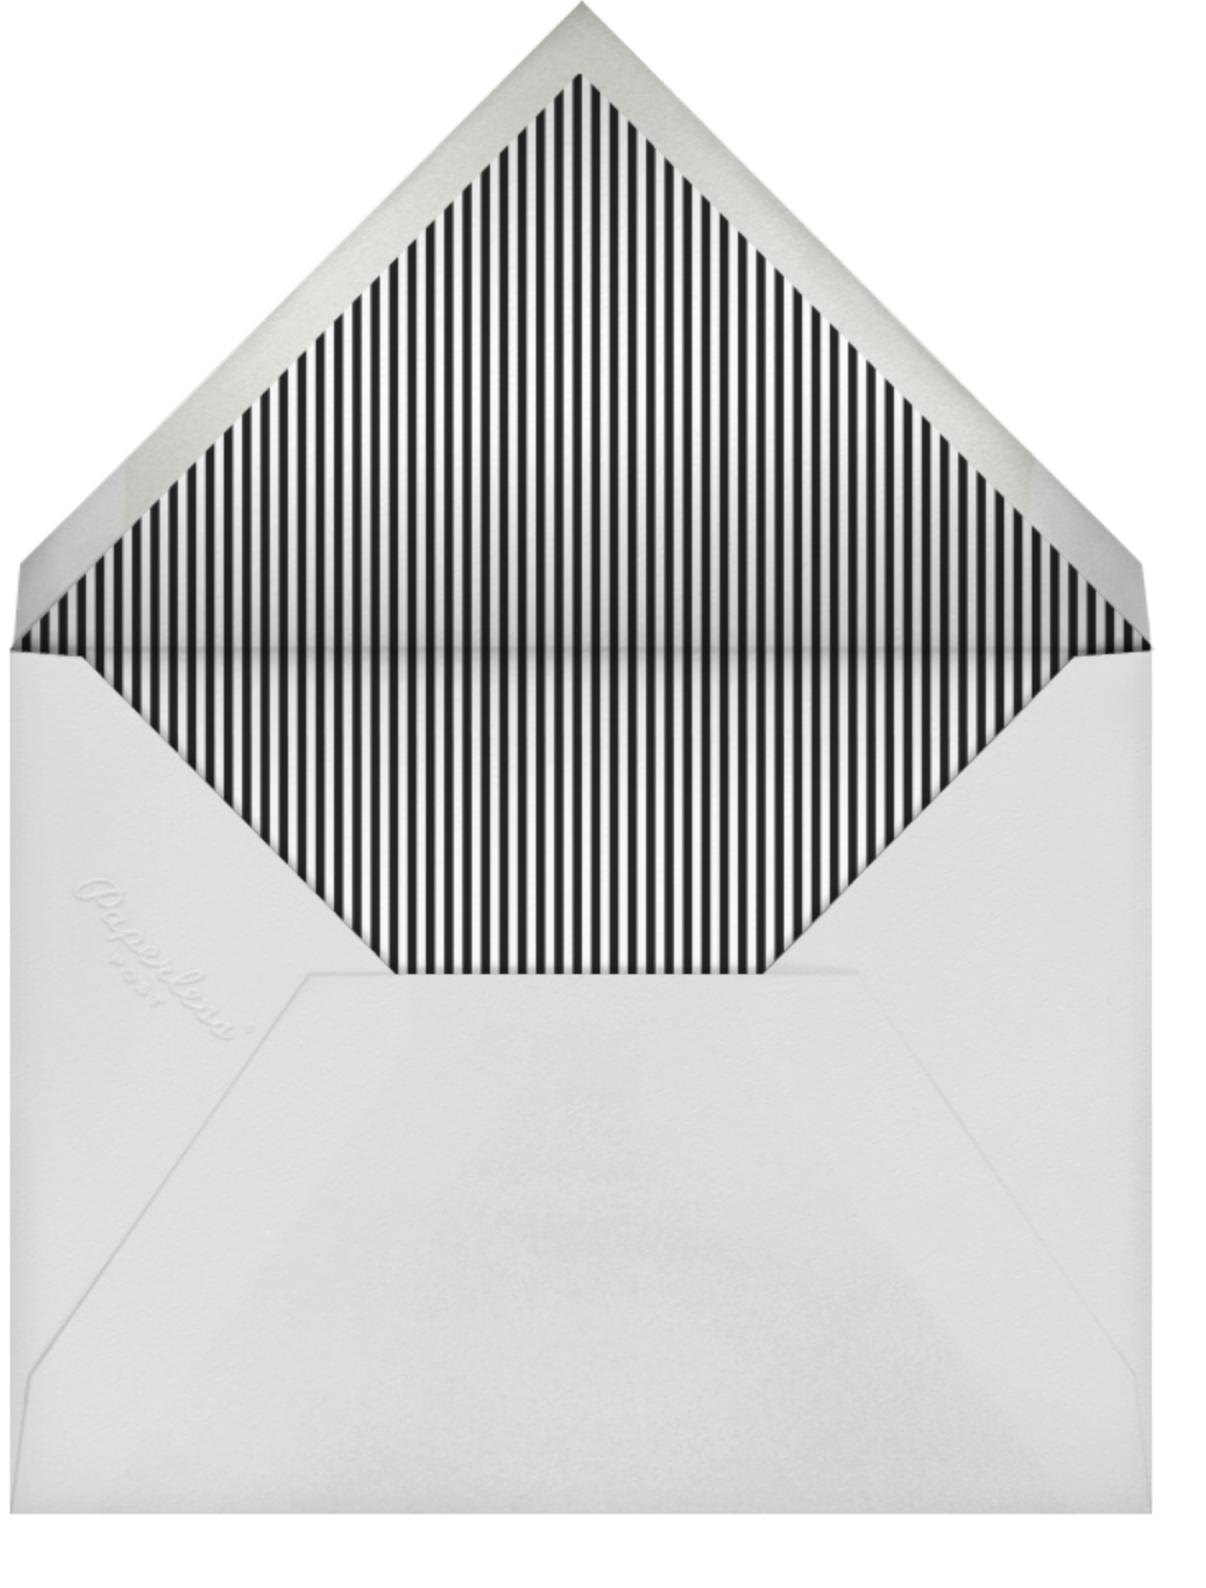 Older and Wiser - White - Sugar Paper - Adult birthday - envelope back